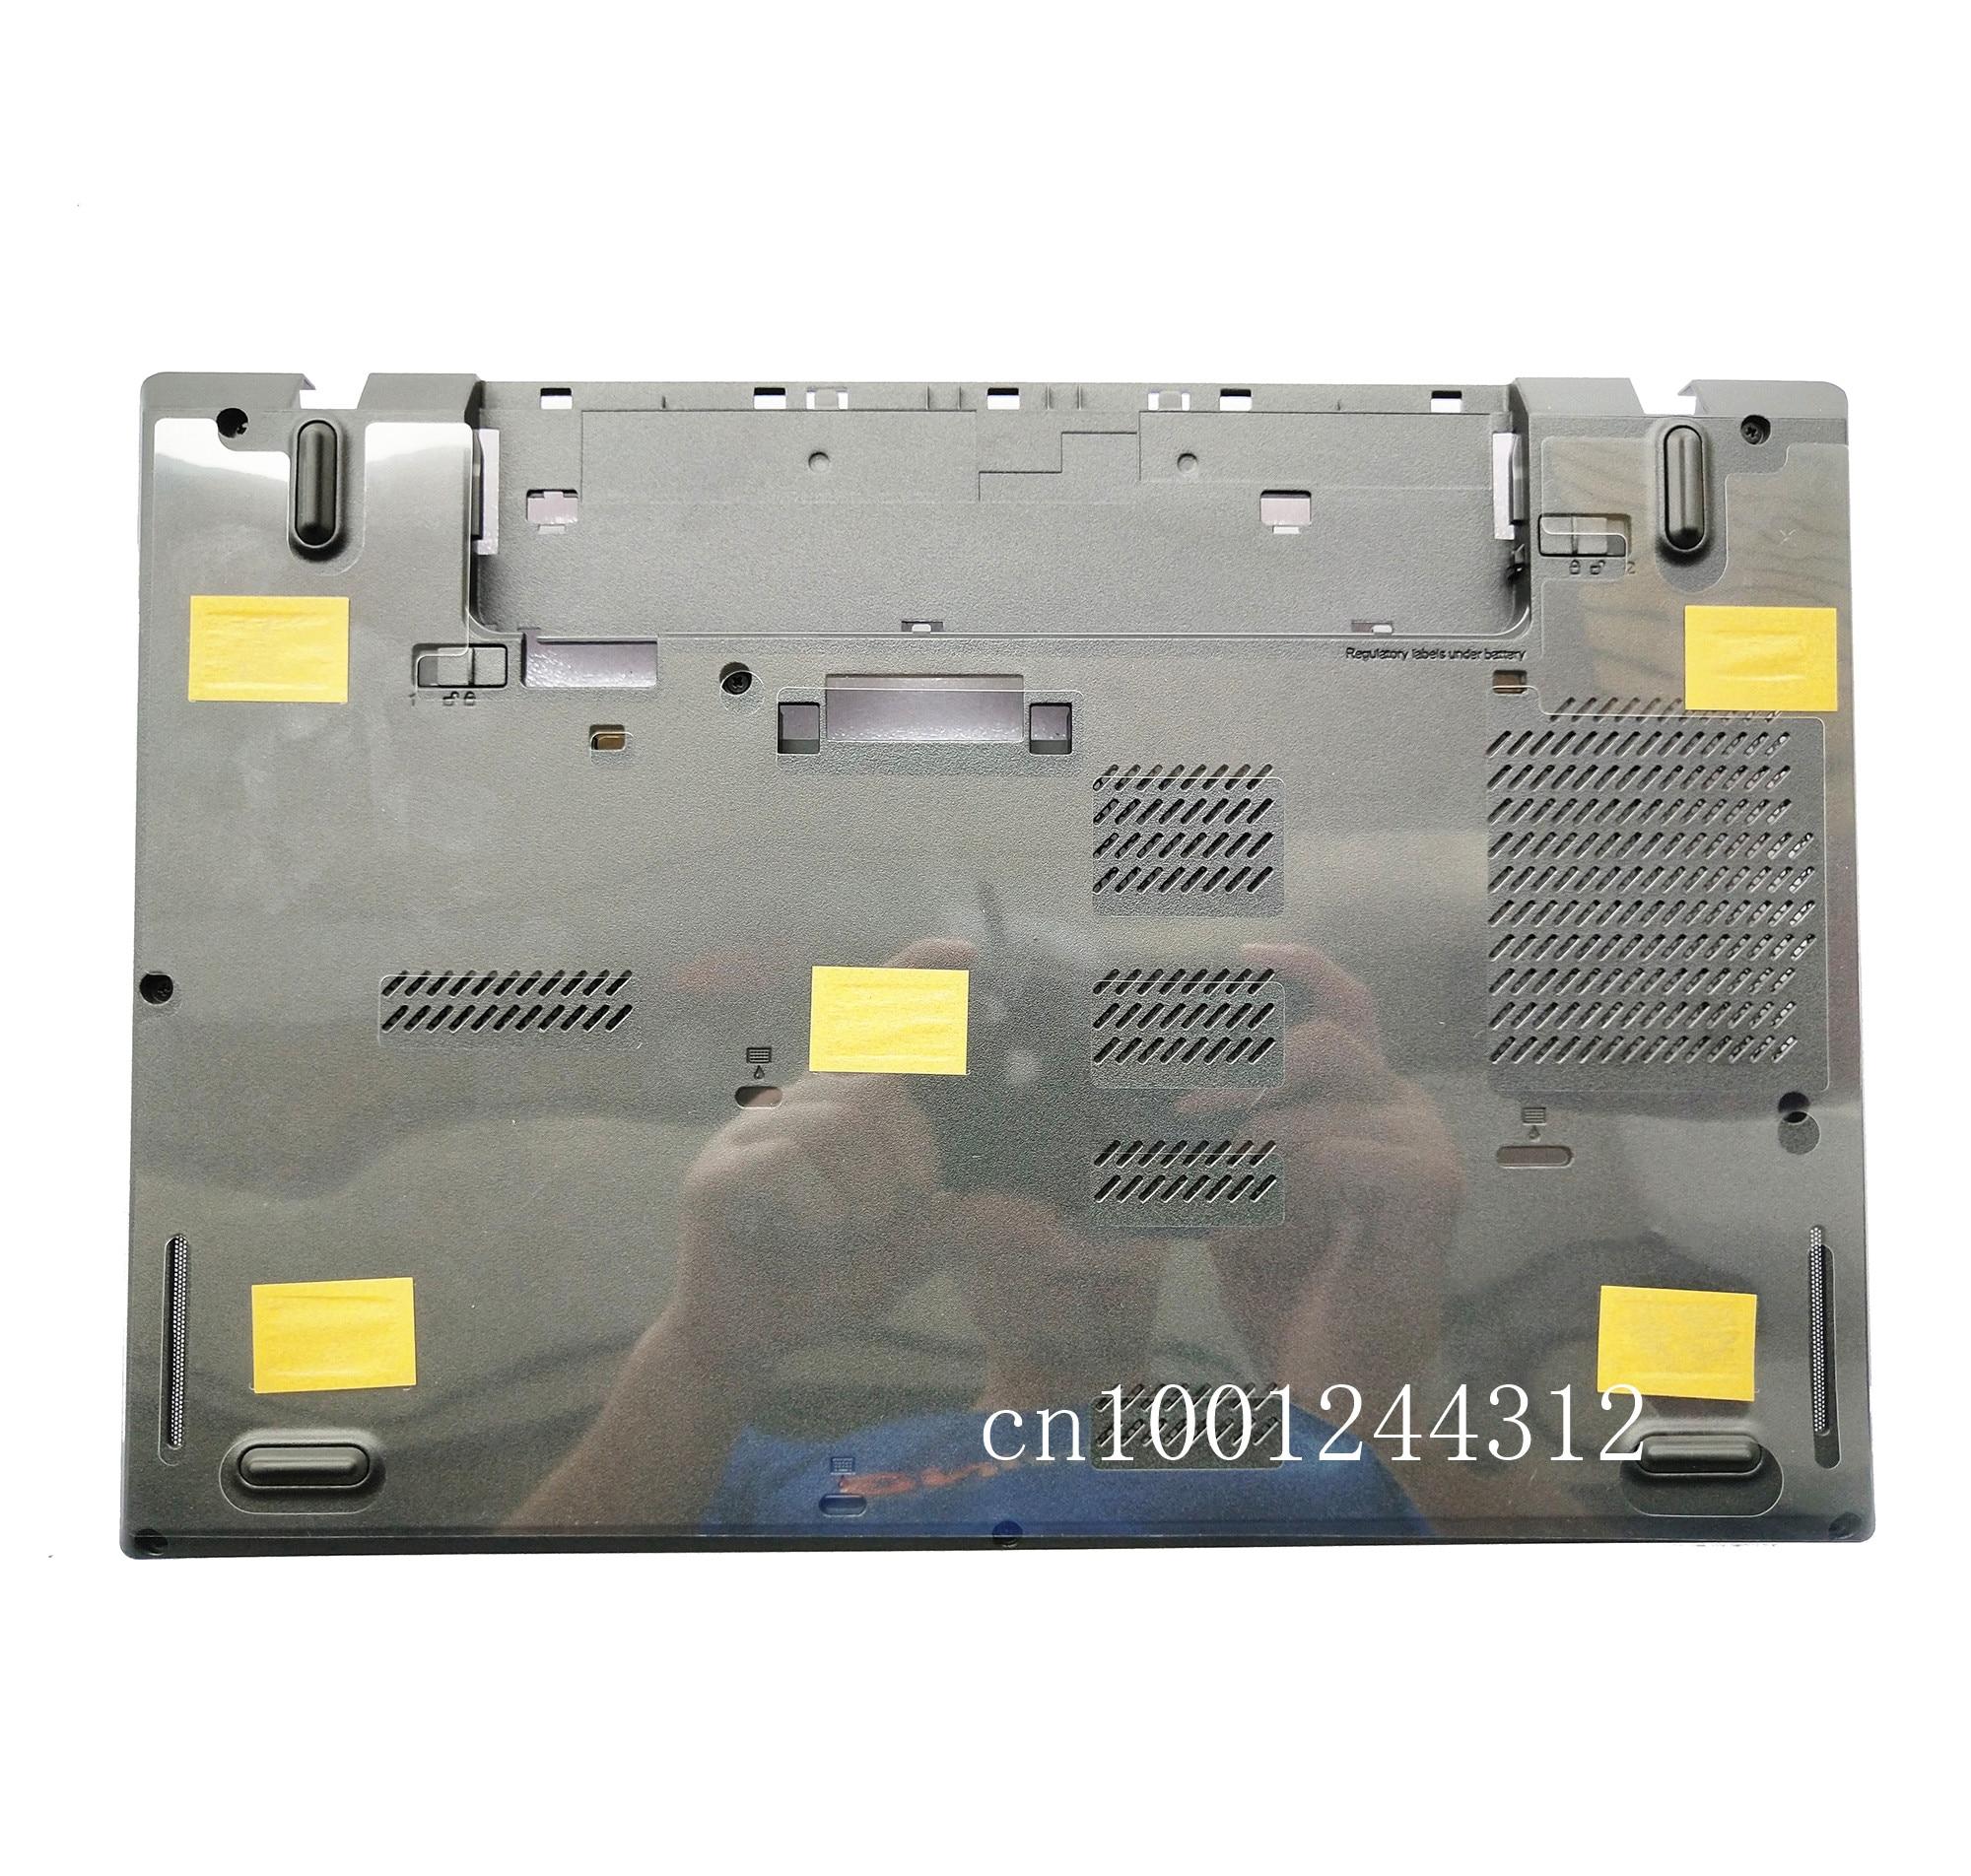 New 00HT820 00HT821 for Lenovo ThinkPad L450 L460 LCD Screen Hinges Hinge